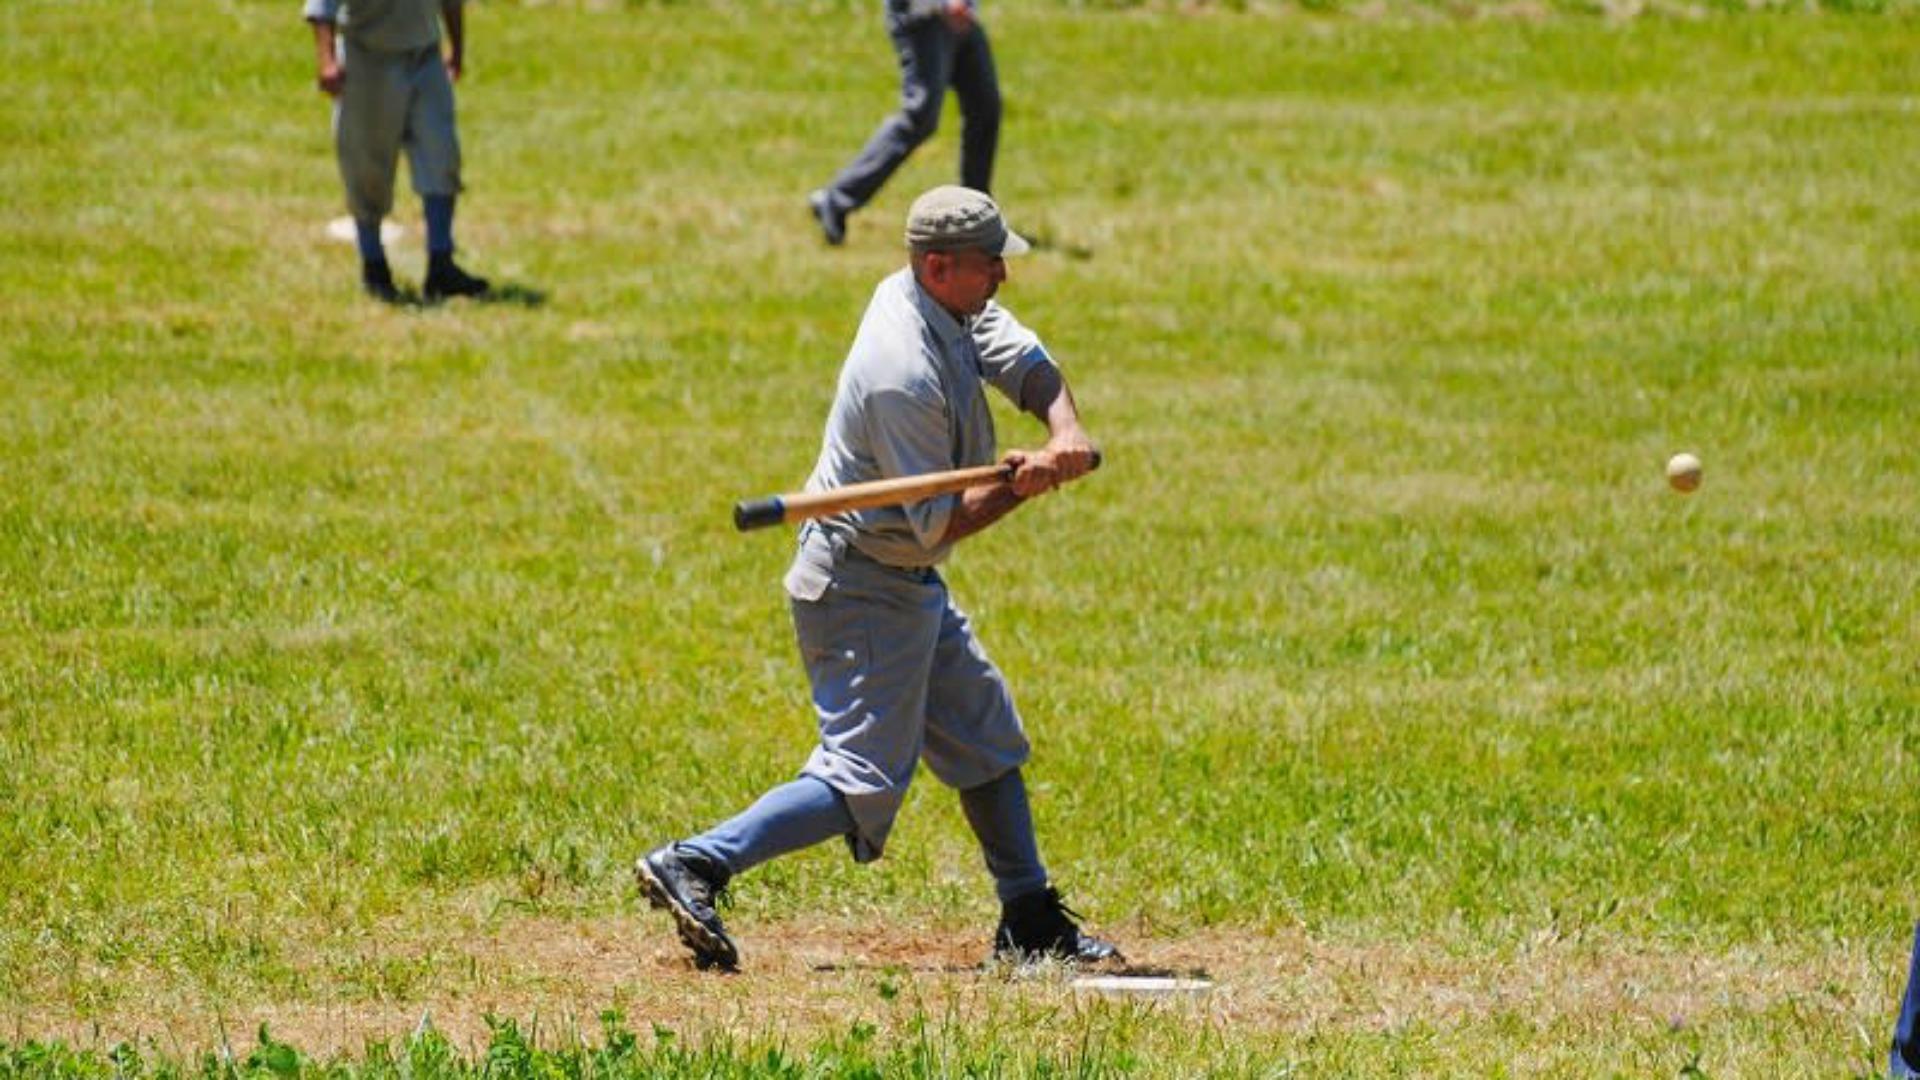 Wicked Rhody: (8/16/19-8/18/19) – Rocky Point Historical Baseball Festival